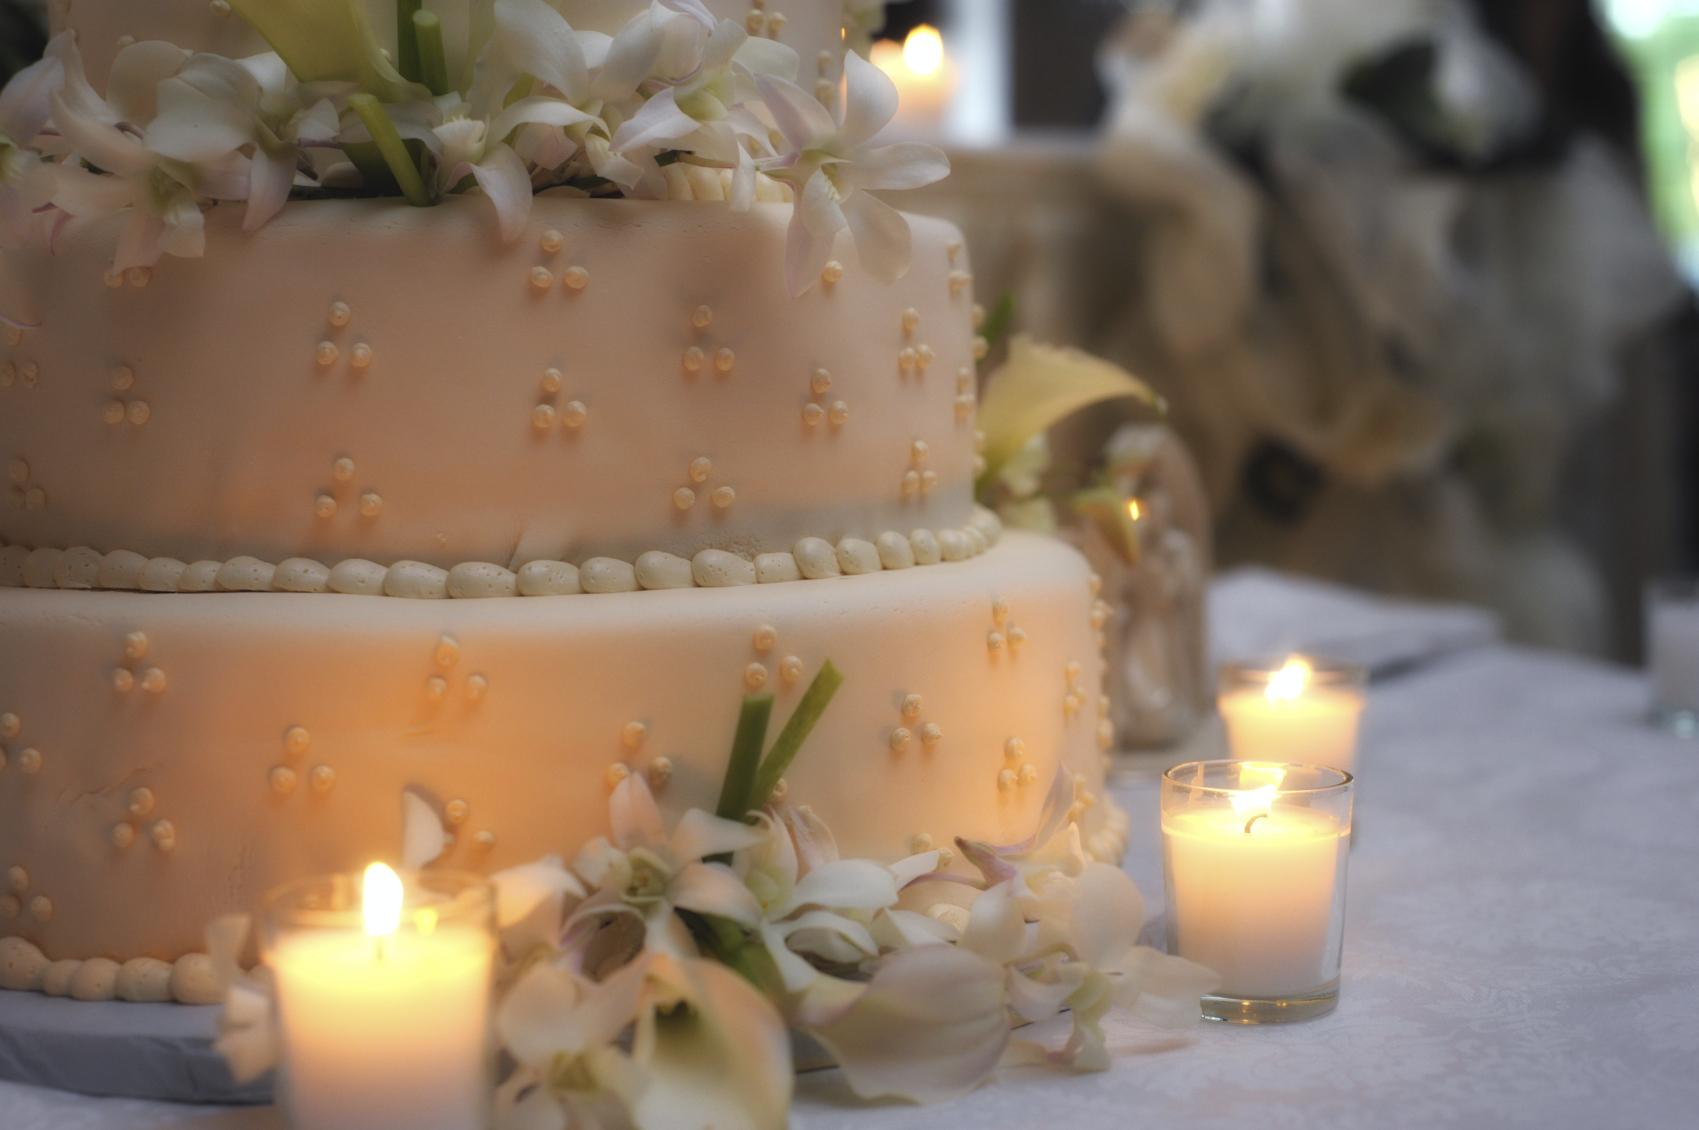 Love S Greeting Elegant Cake Cutting Music